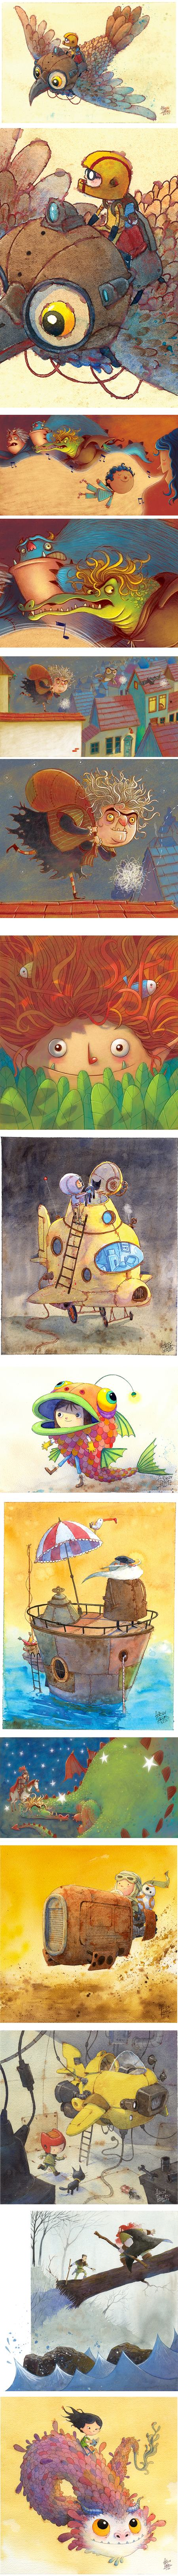 Adilson Farias, children's book illustration